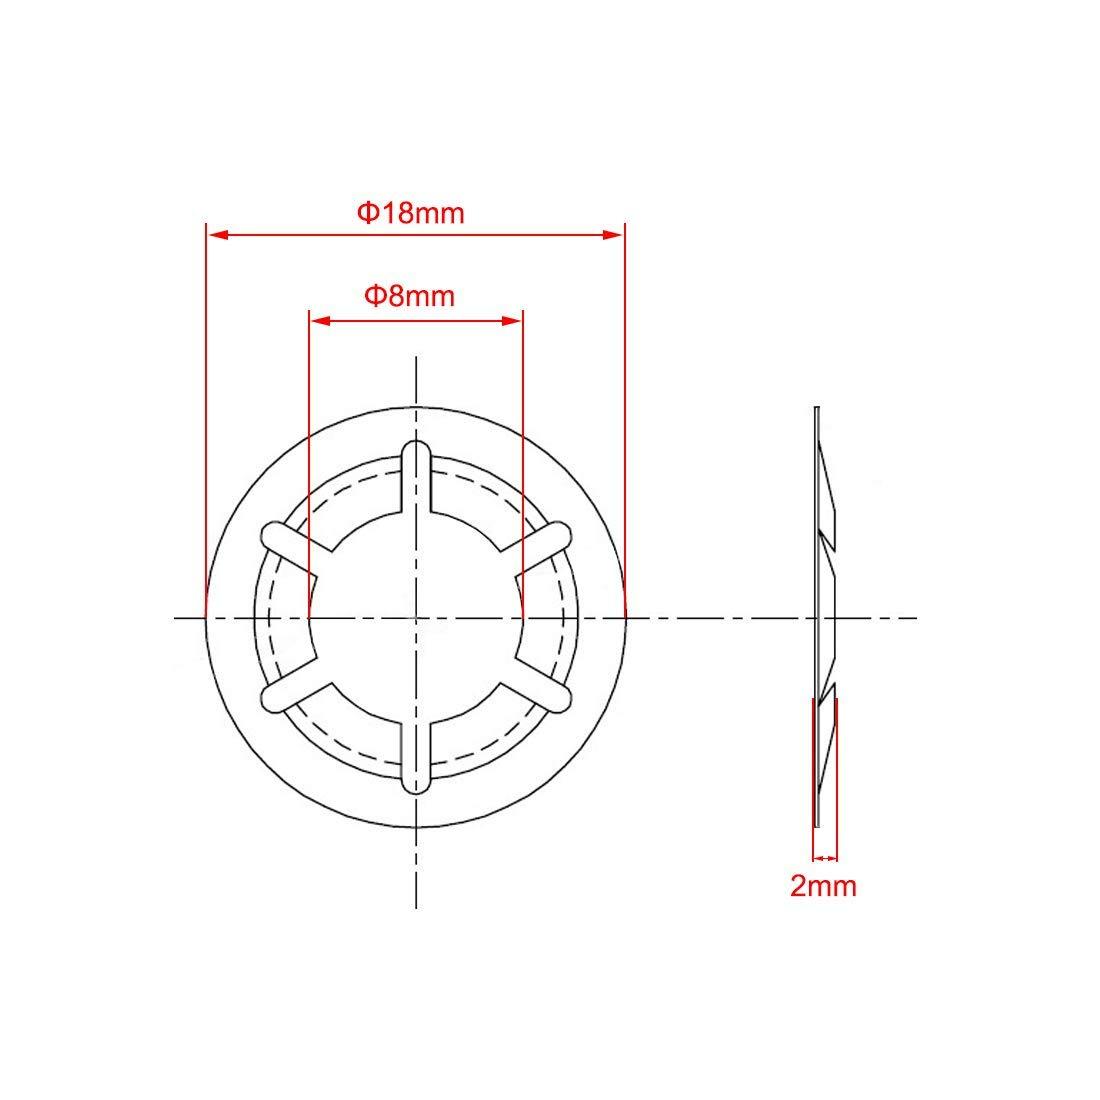 Pressurized Pressure Washer Fixing washers Clip Holder 8 mm Internal Diameter 18 mm External Diameter M8 Internal Tooth starlock Washer 200 Pieces